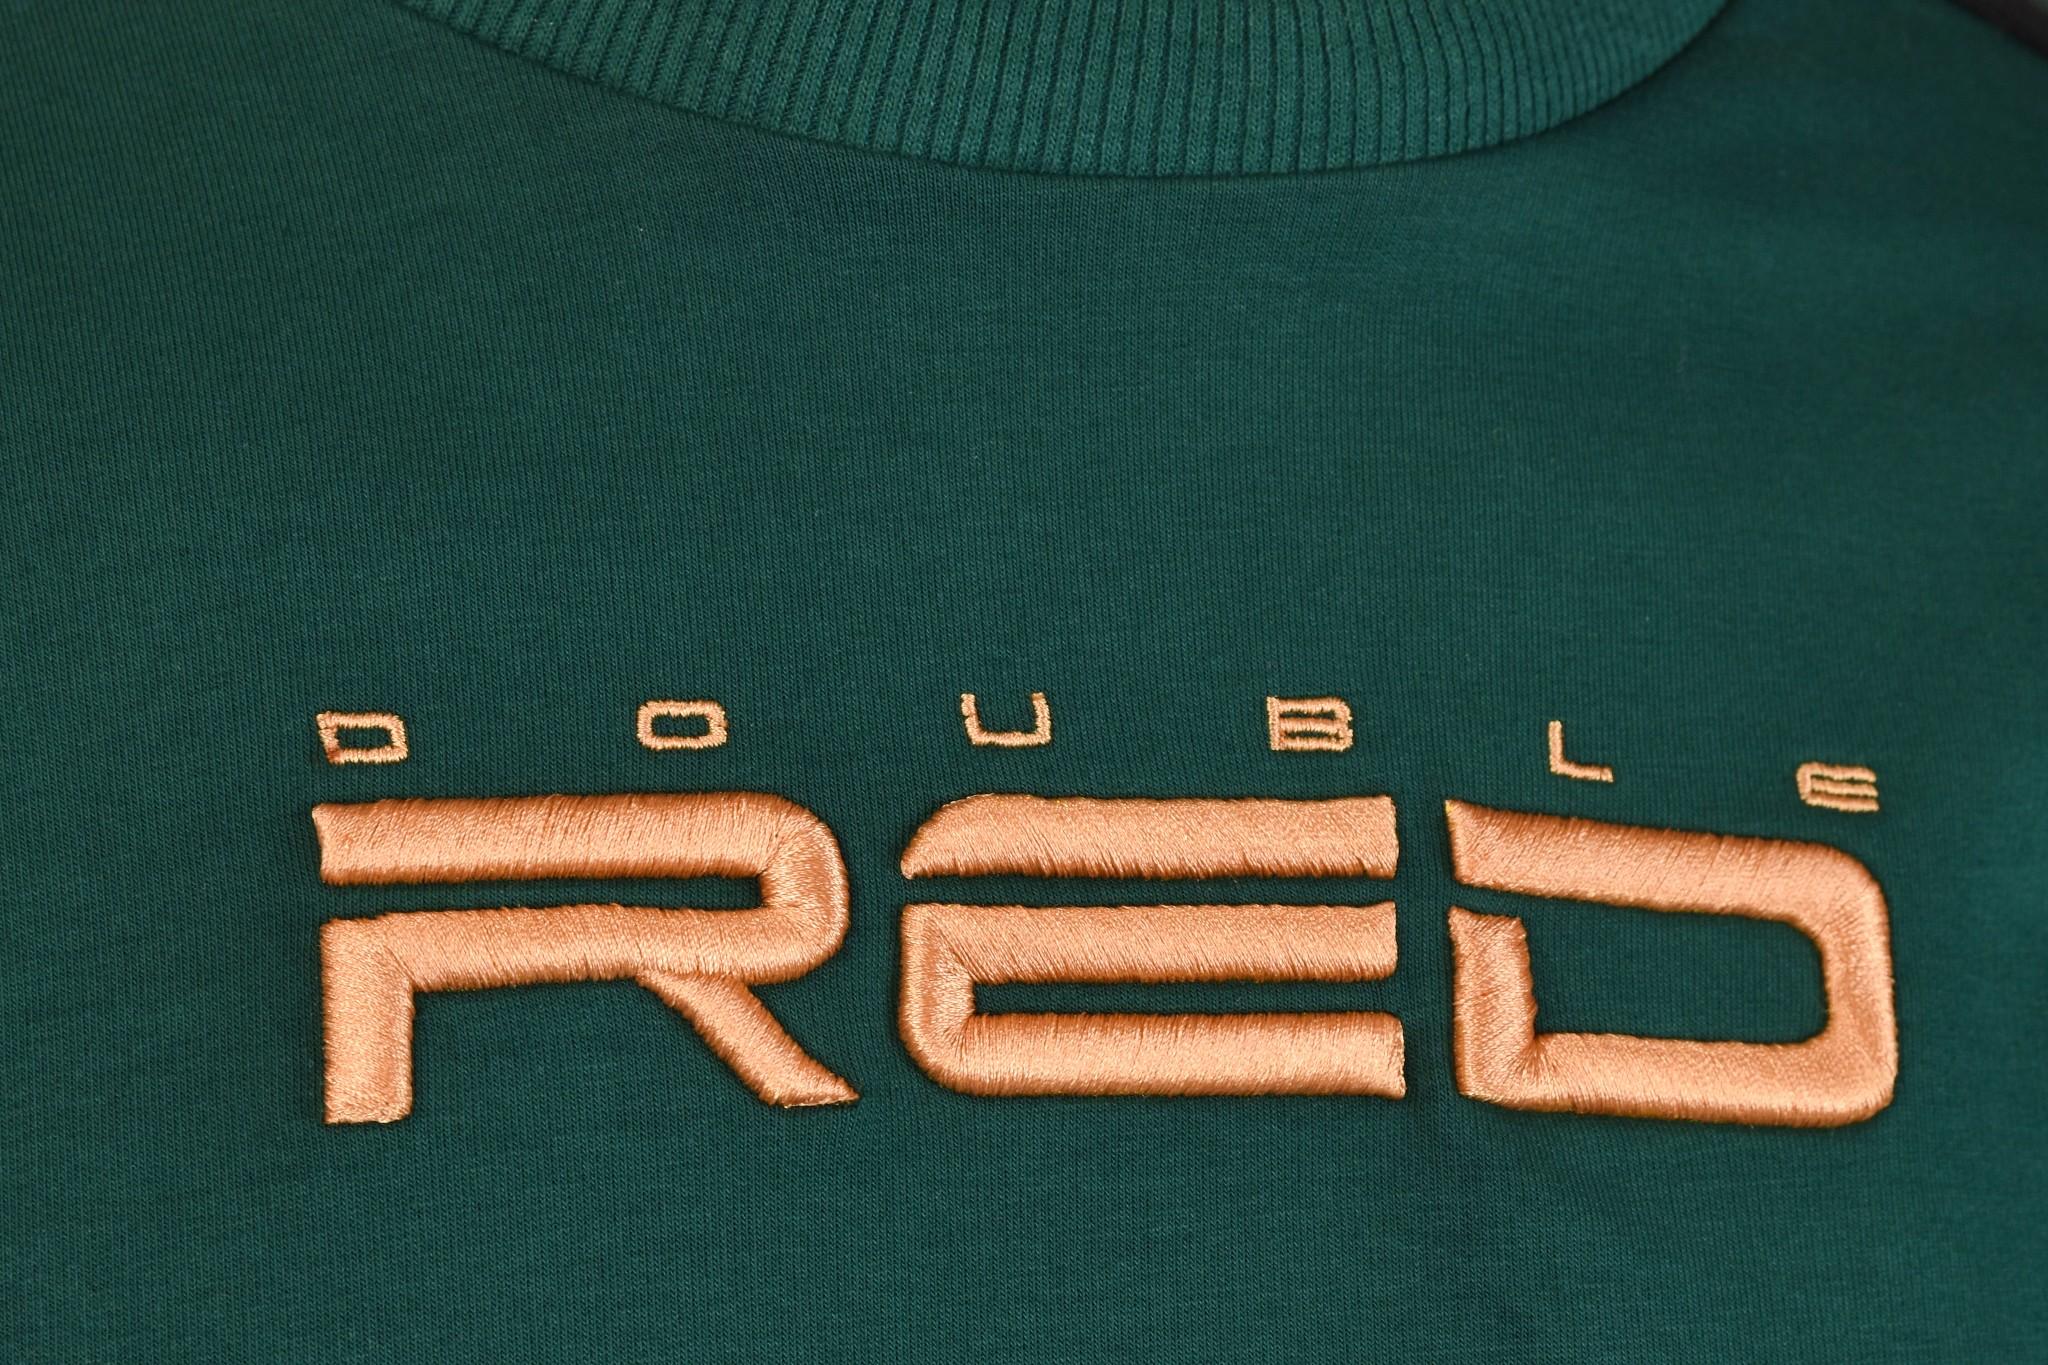 ELEGANCE All logo Sweatshirt Green/Orange